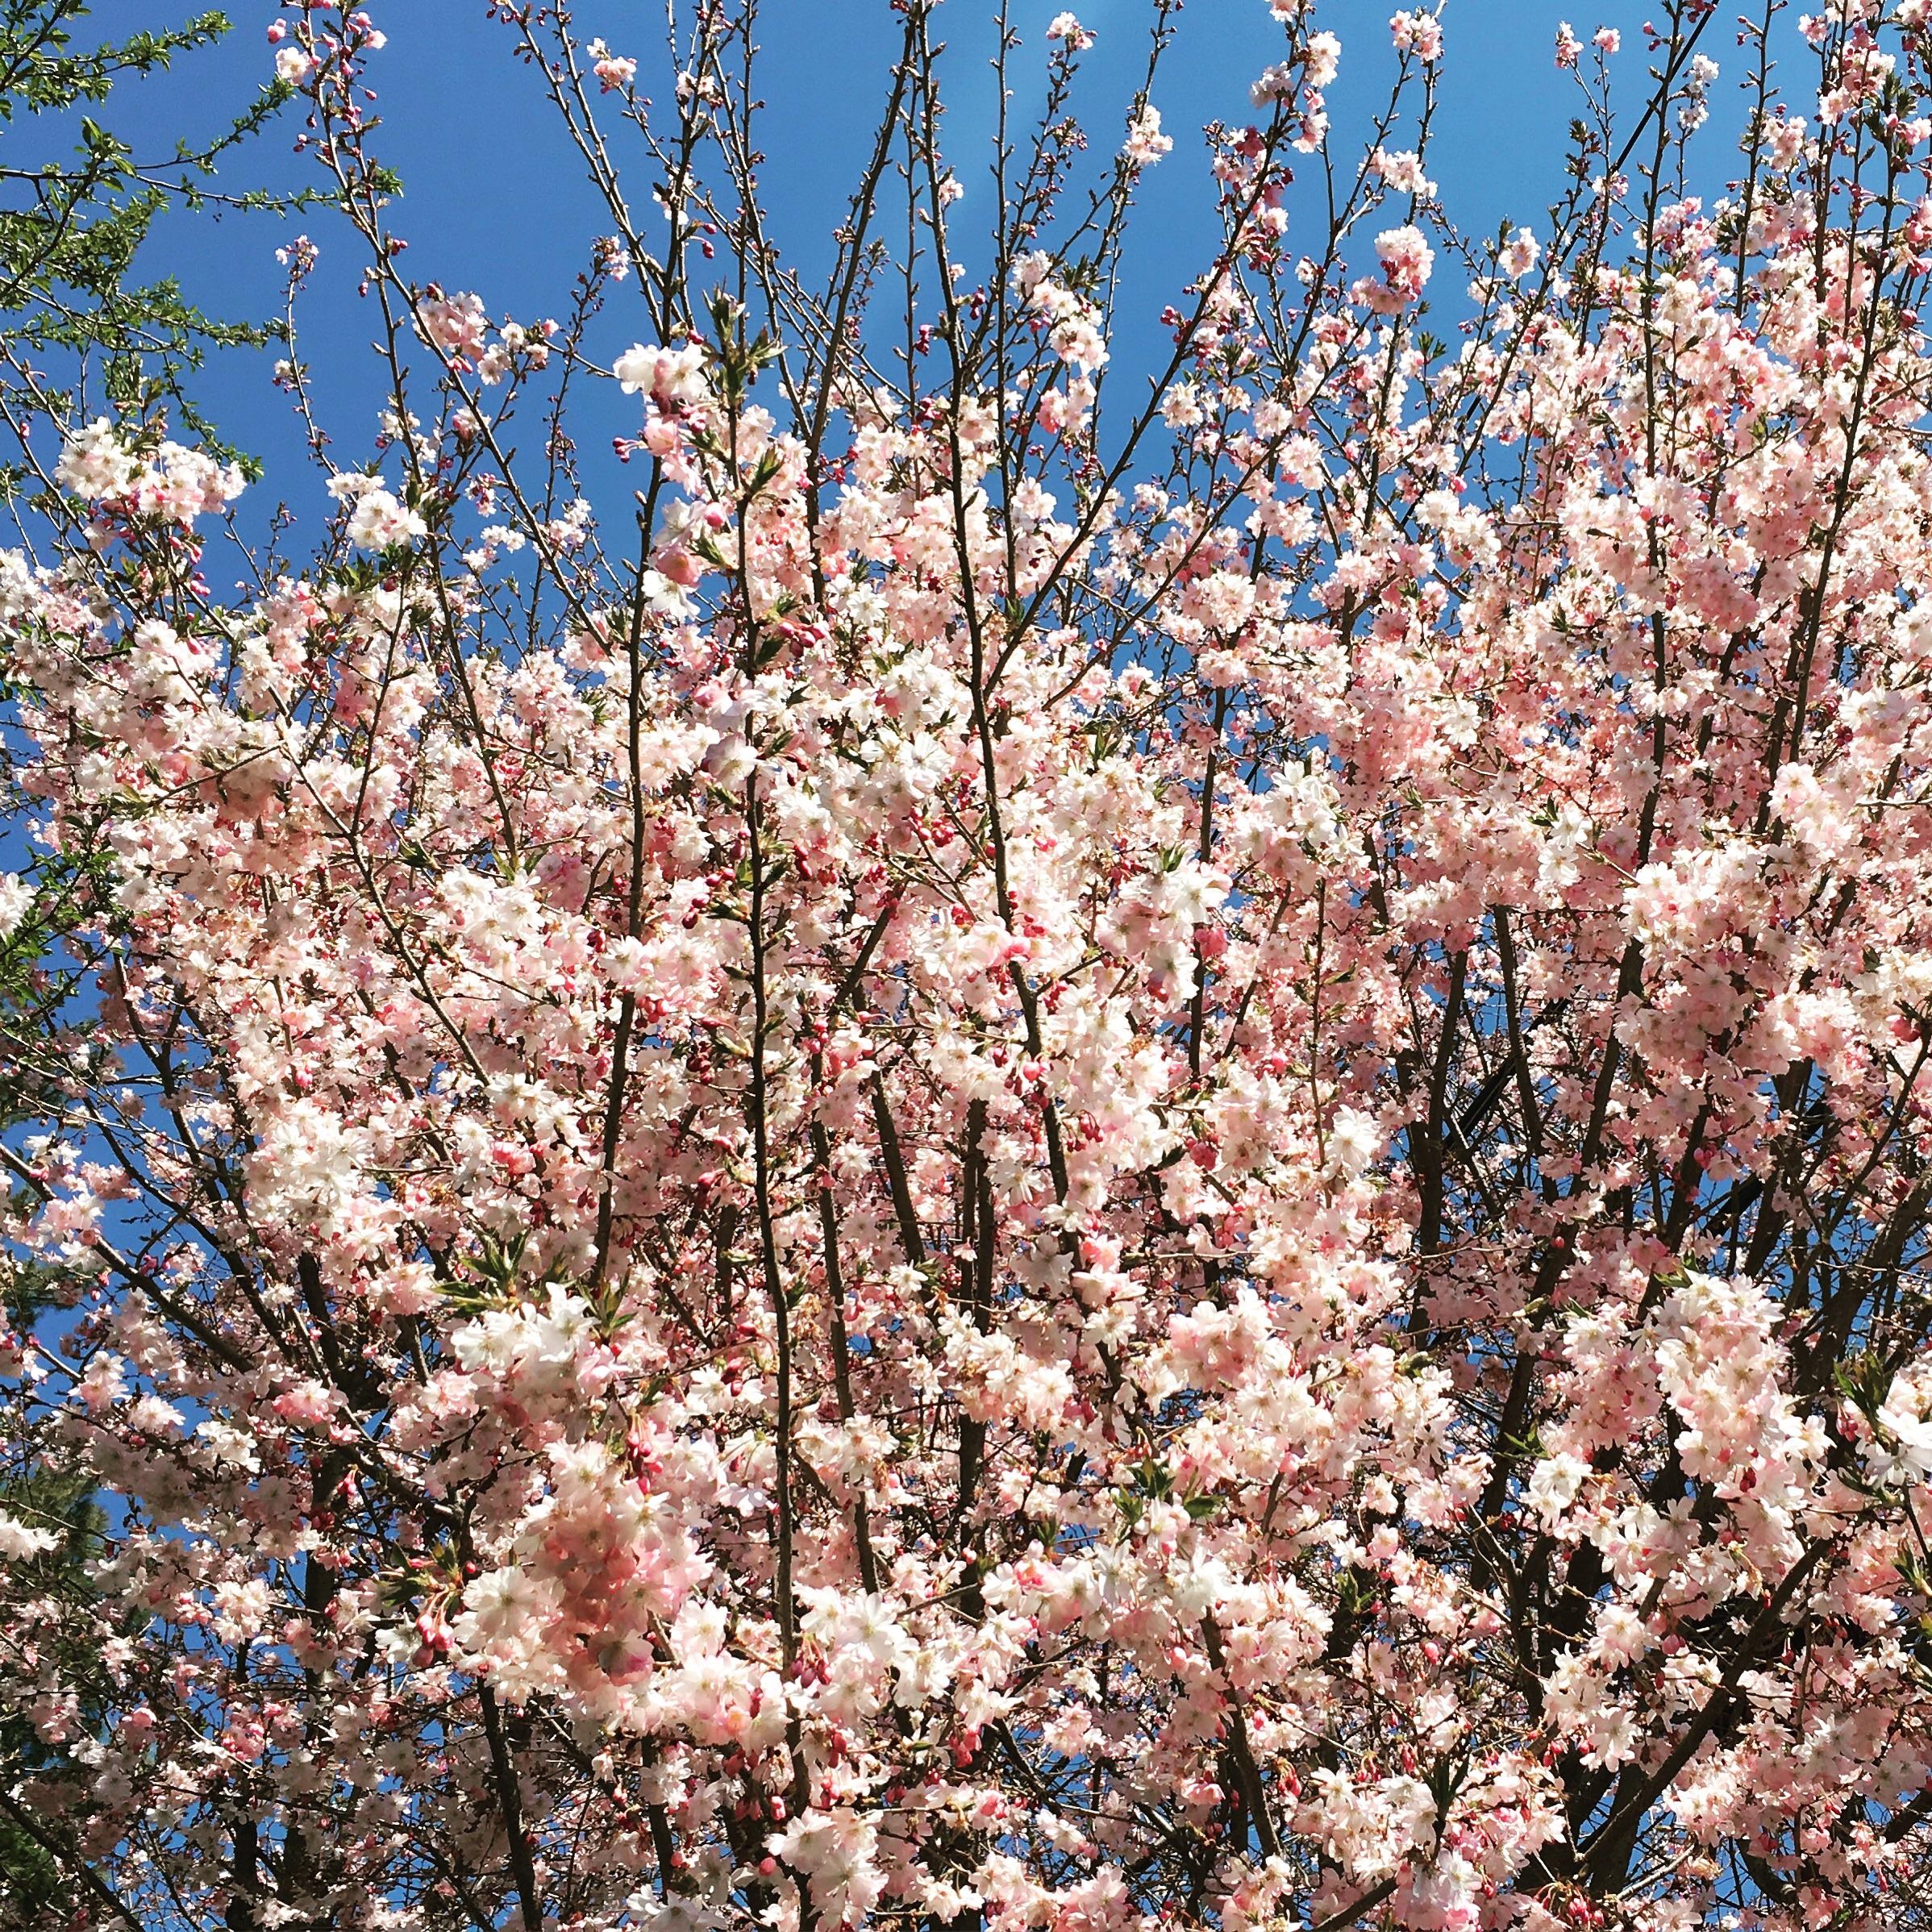 {Cheerful Cherry Blossoms}